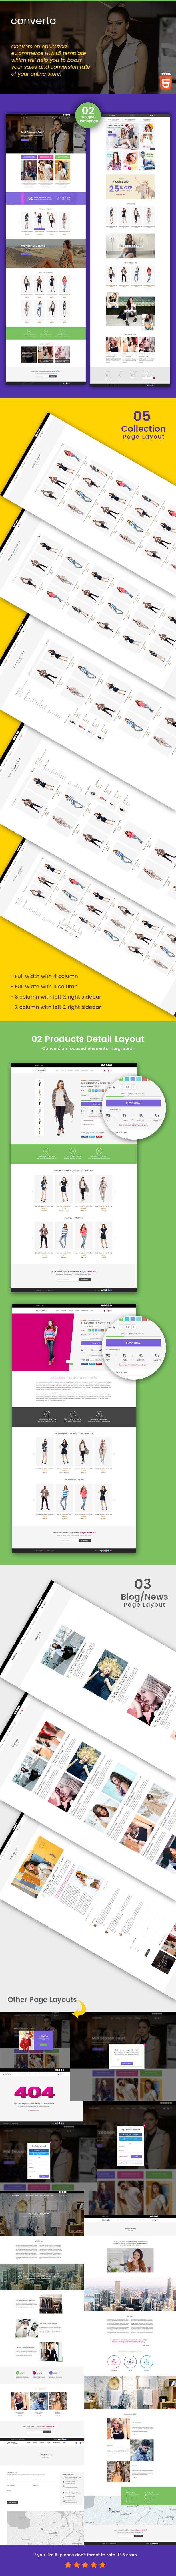 Converto - Conversion Optimized eCommerce HTML5 Template - 1